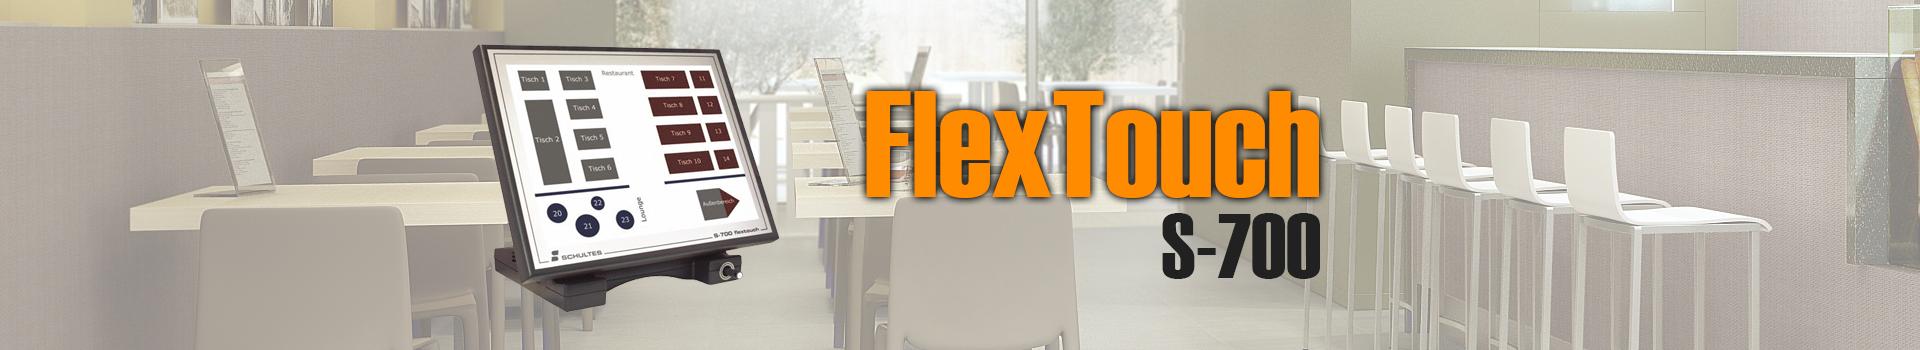 Flextouch